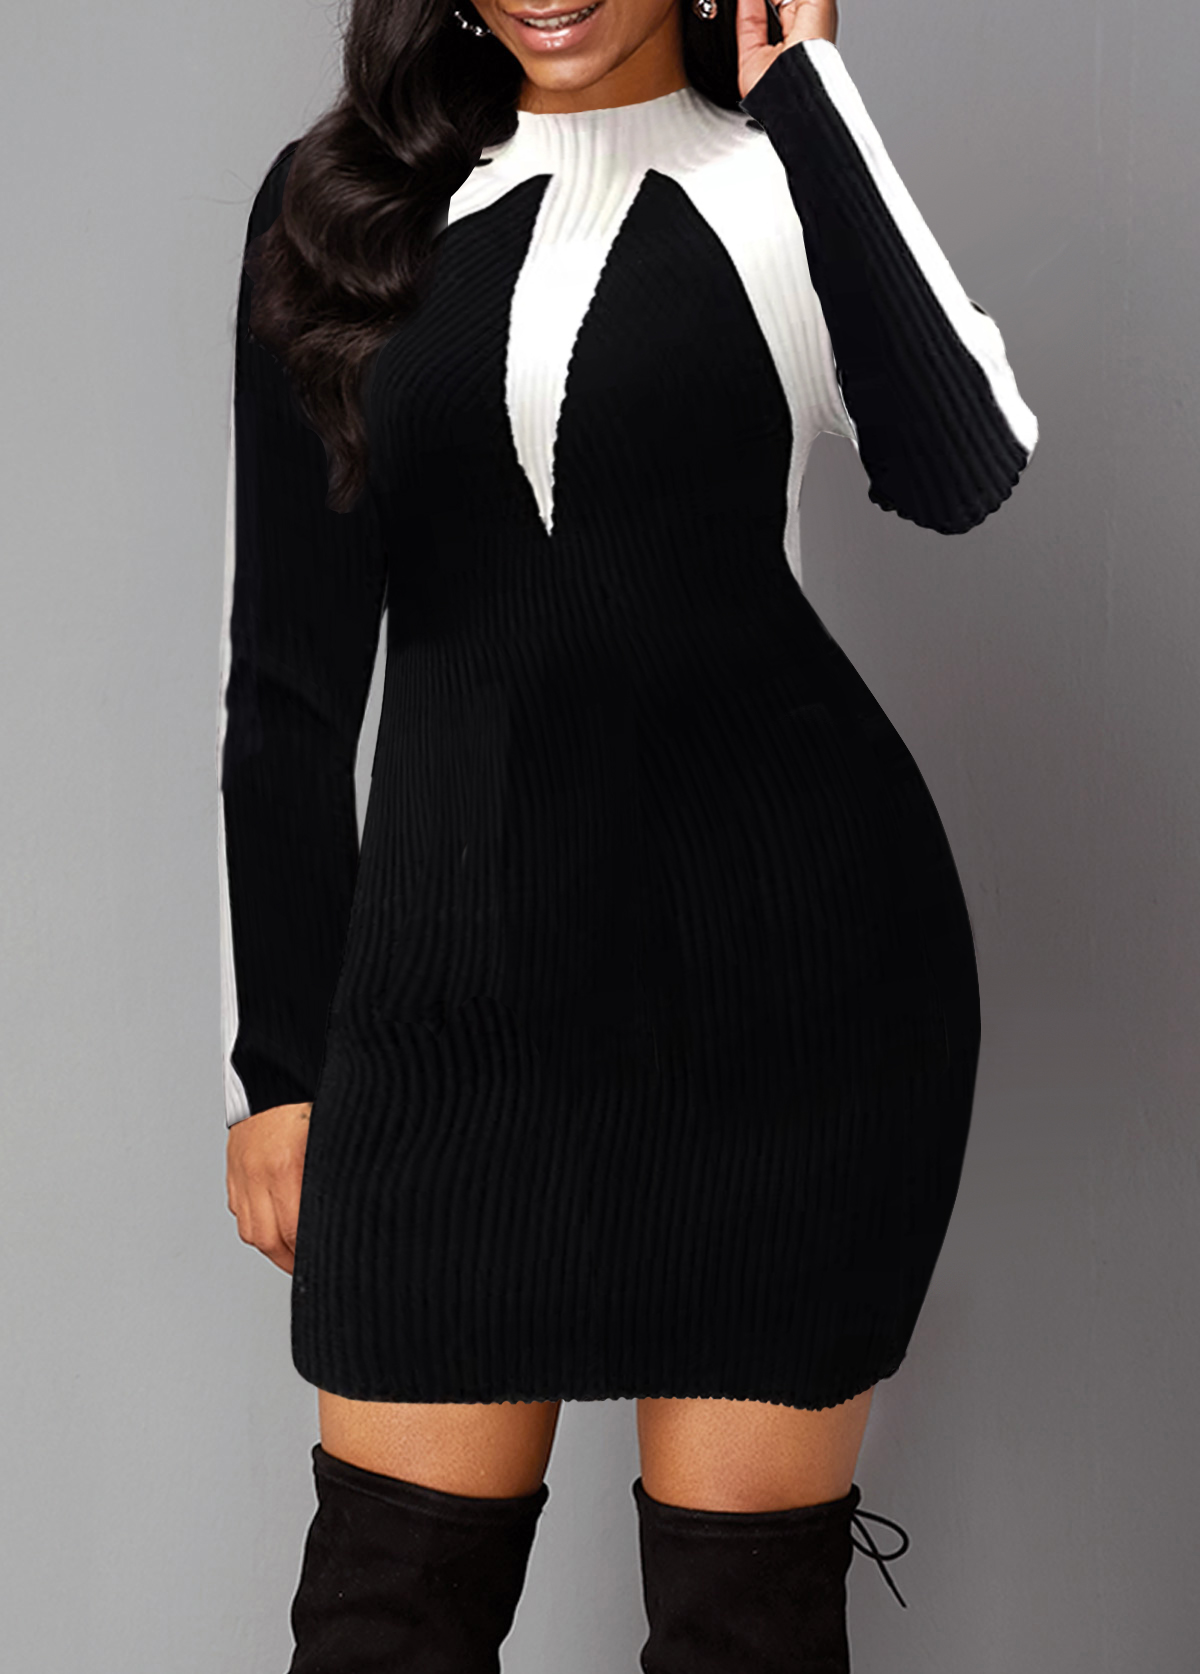 Black Long Sleeve Mock Neck Sweater Dress